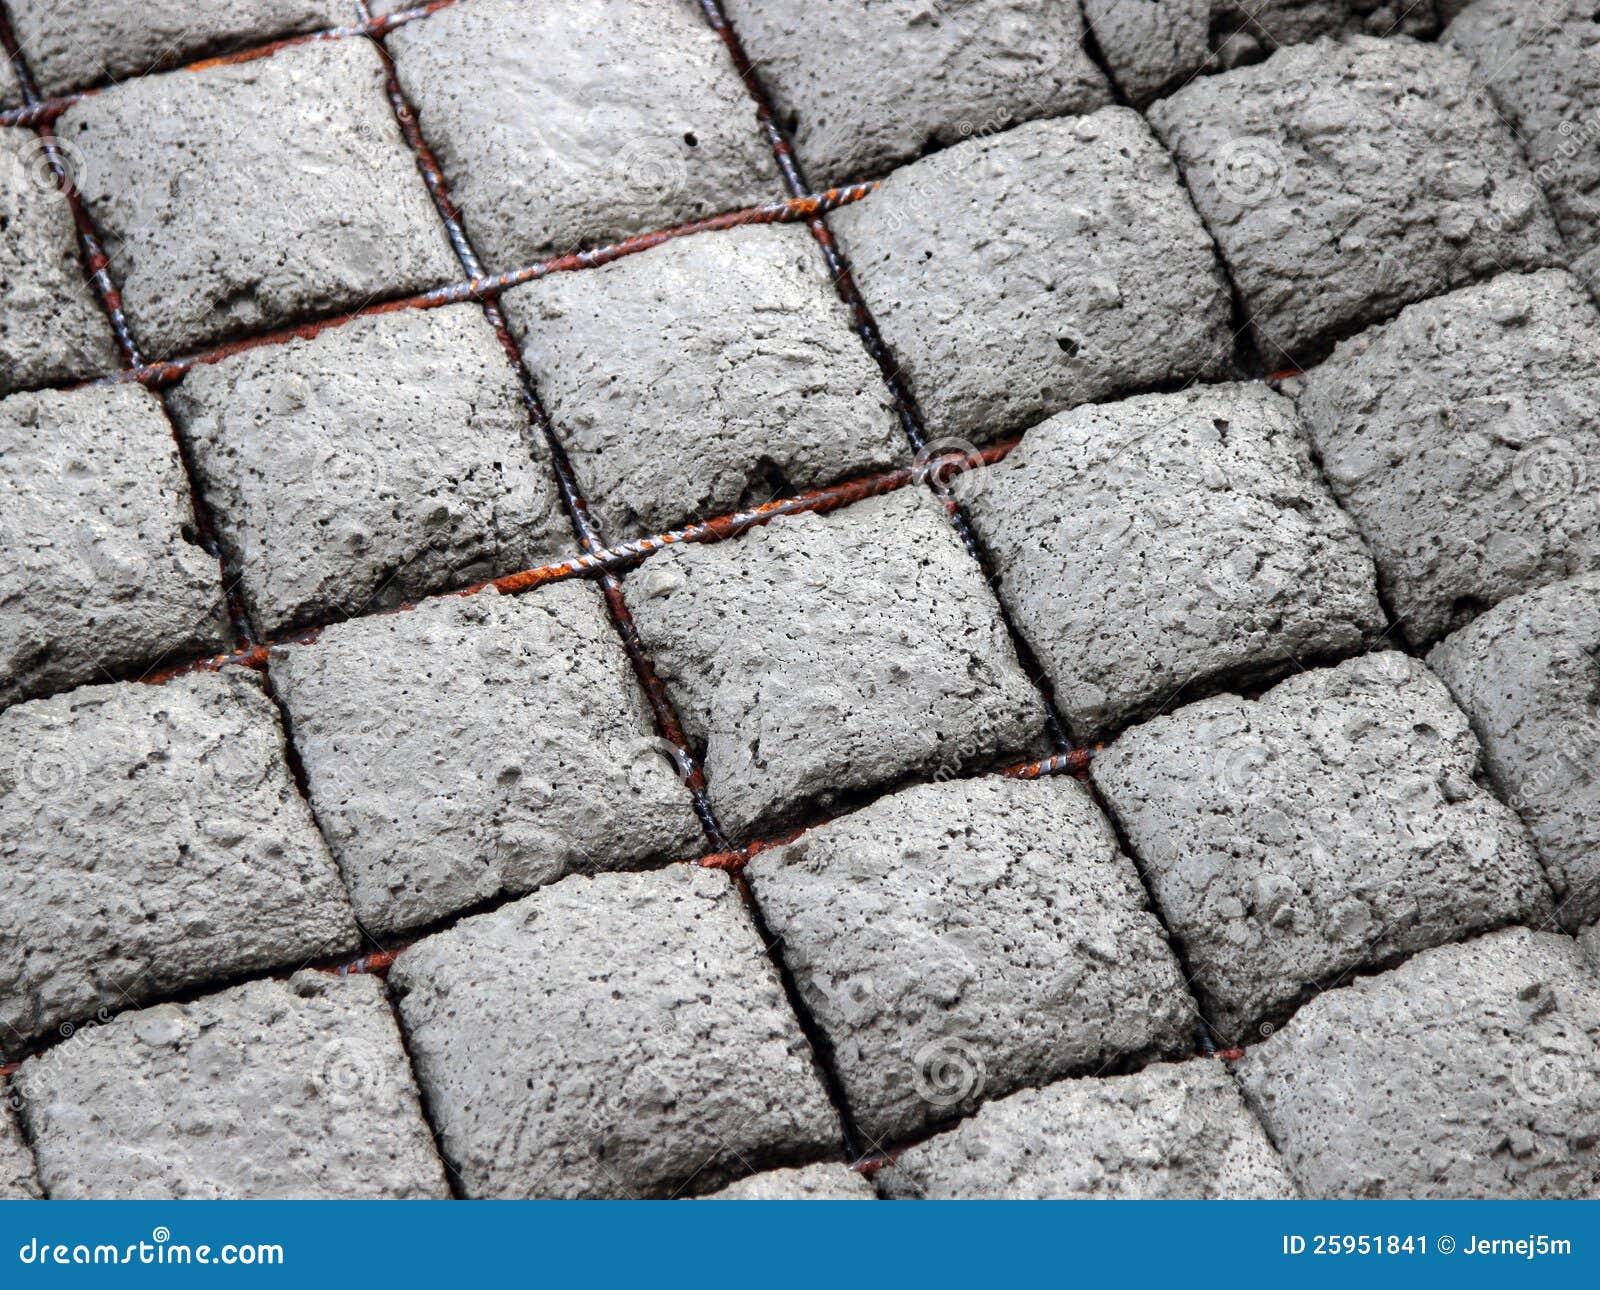 Precast Concrete Curb Reinforcement : Reinforcing mesh in concrete stock image